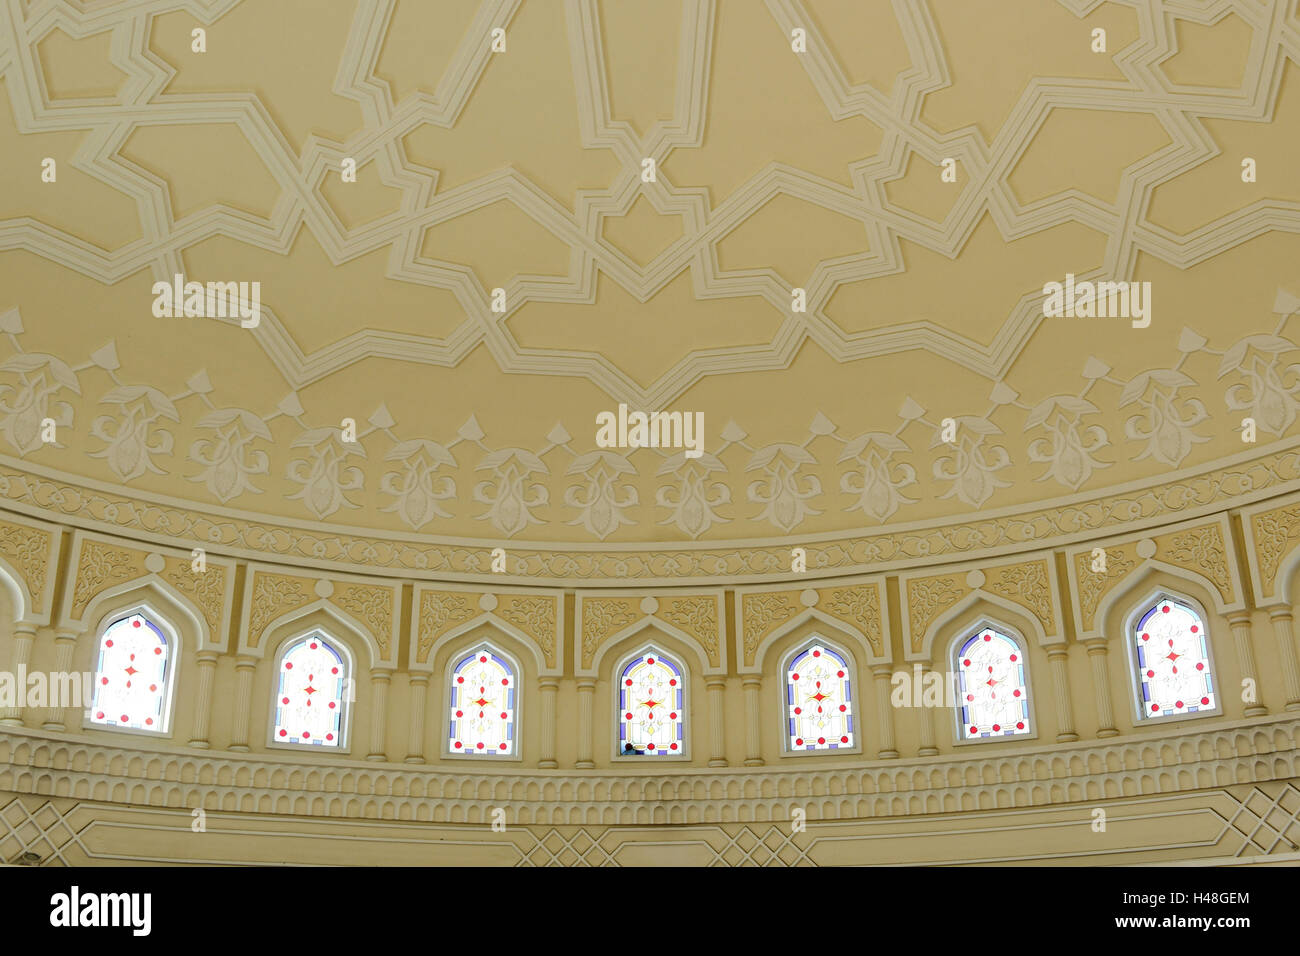 Ceiling ornament, Old Souk, blue Souk, traditional shopping centre, Emirate of Sharjah, United Arab Emirates, Arabian - Stock Image